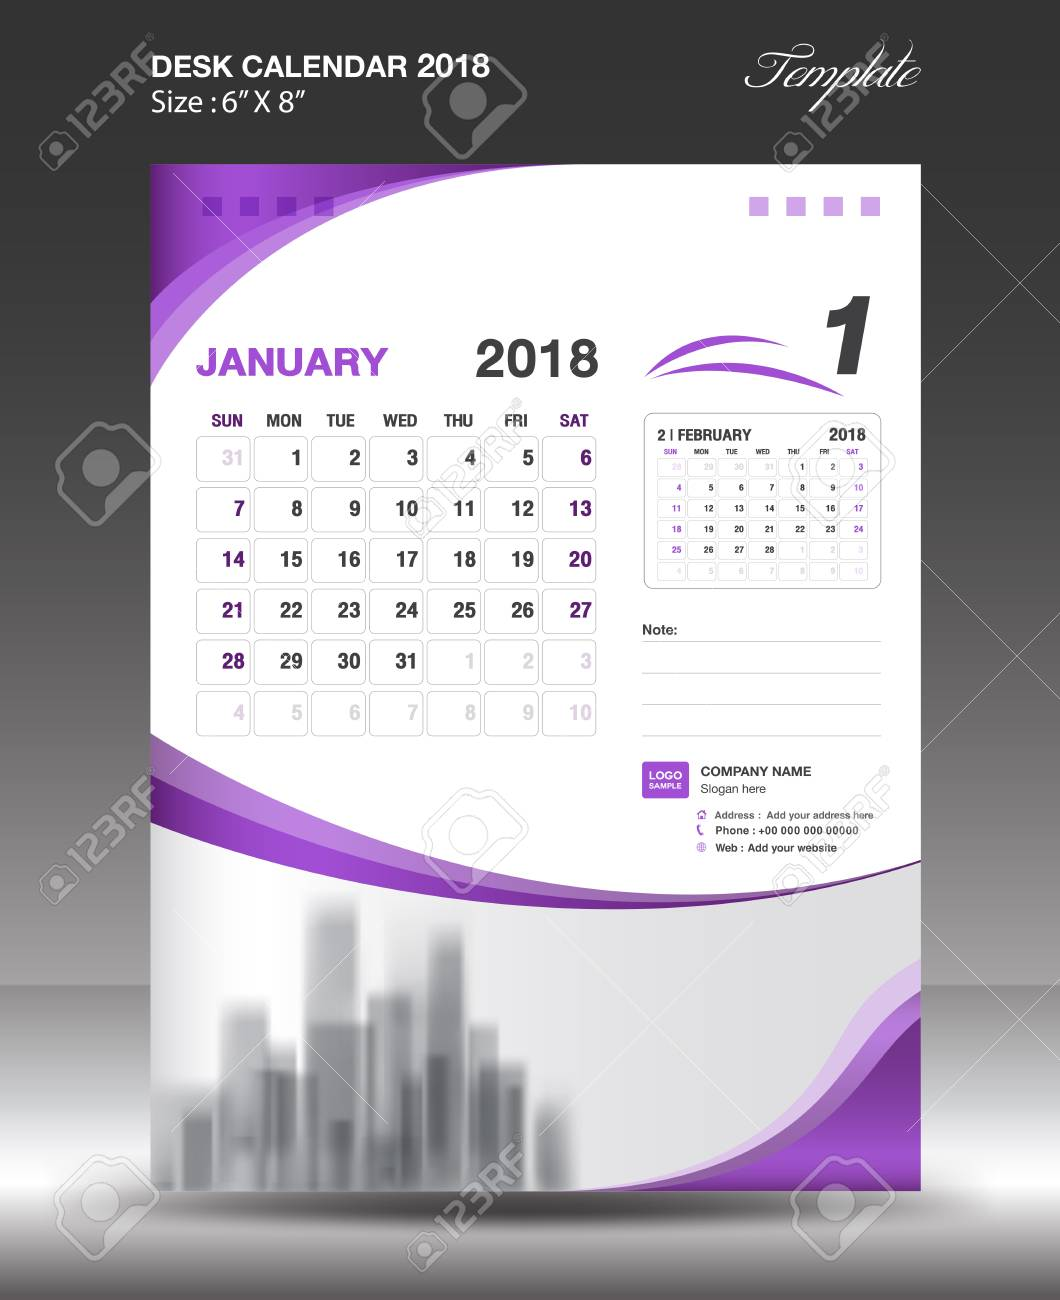 january 2018 desk calendar design stock vector 89303874